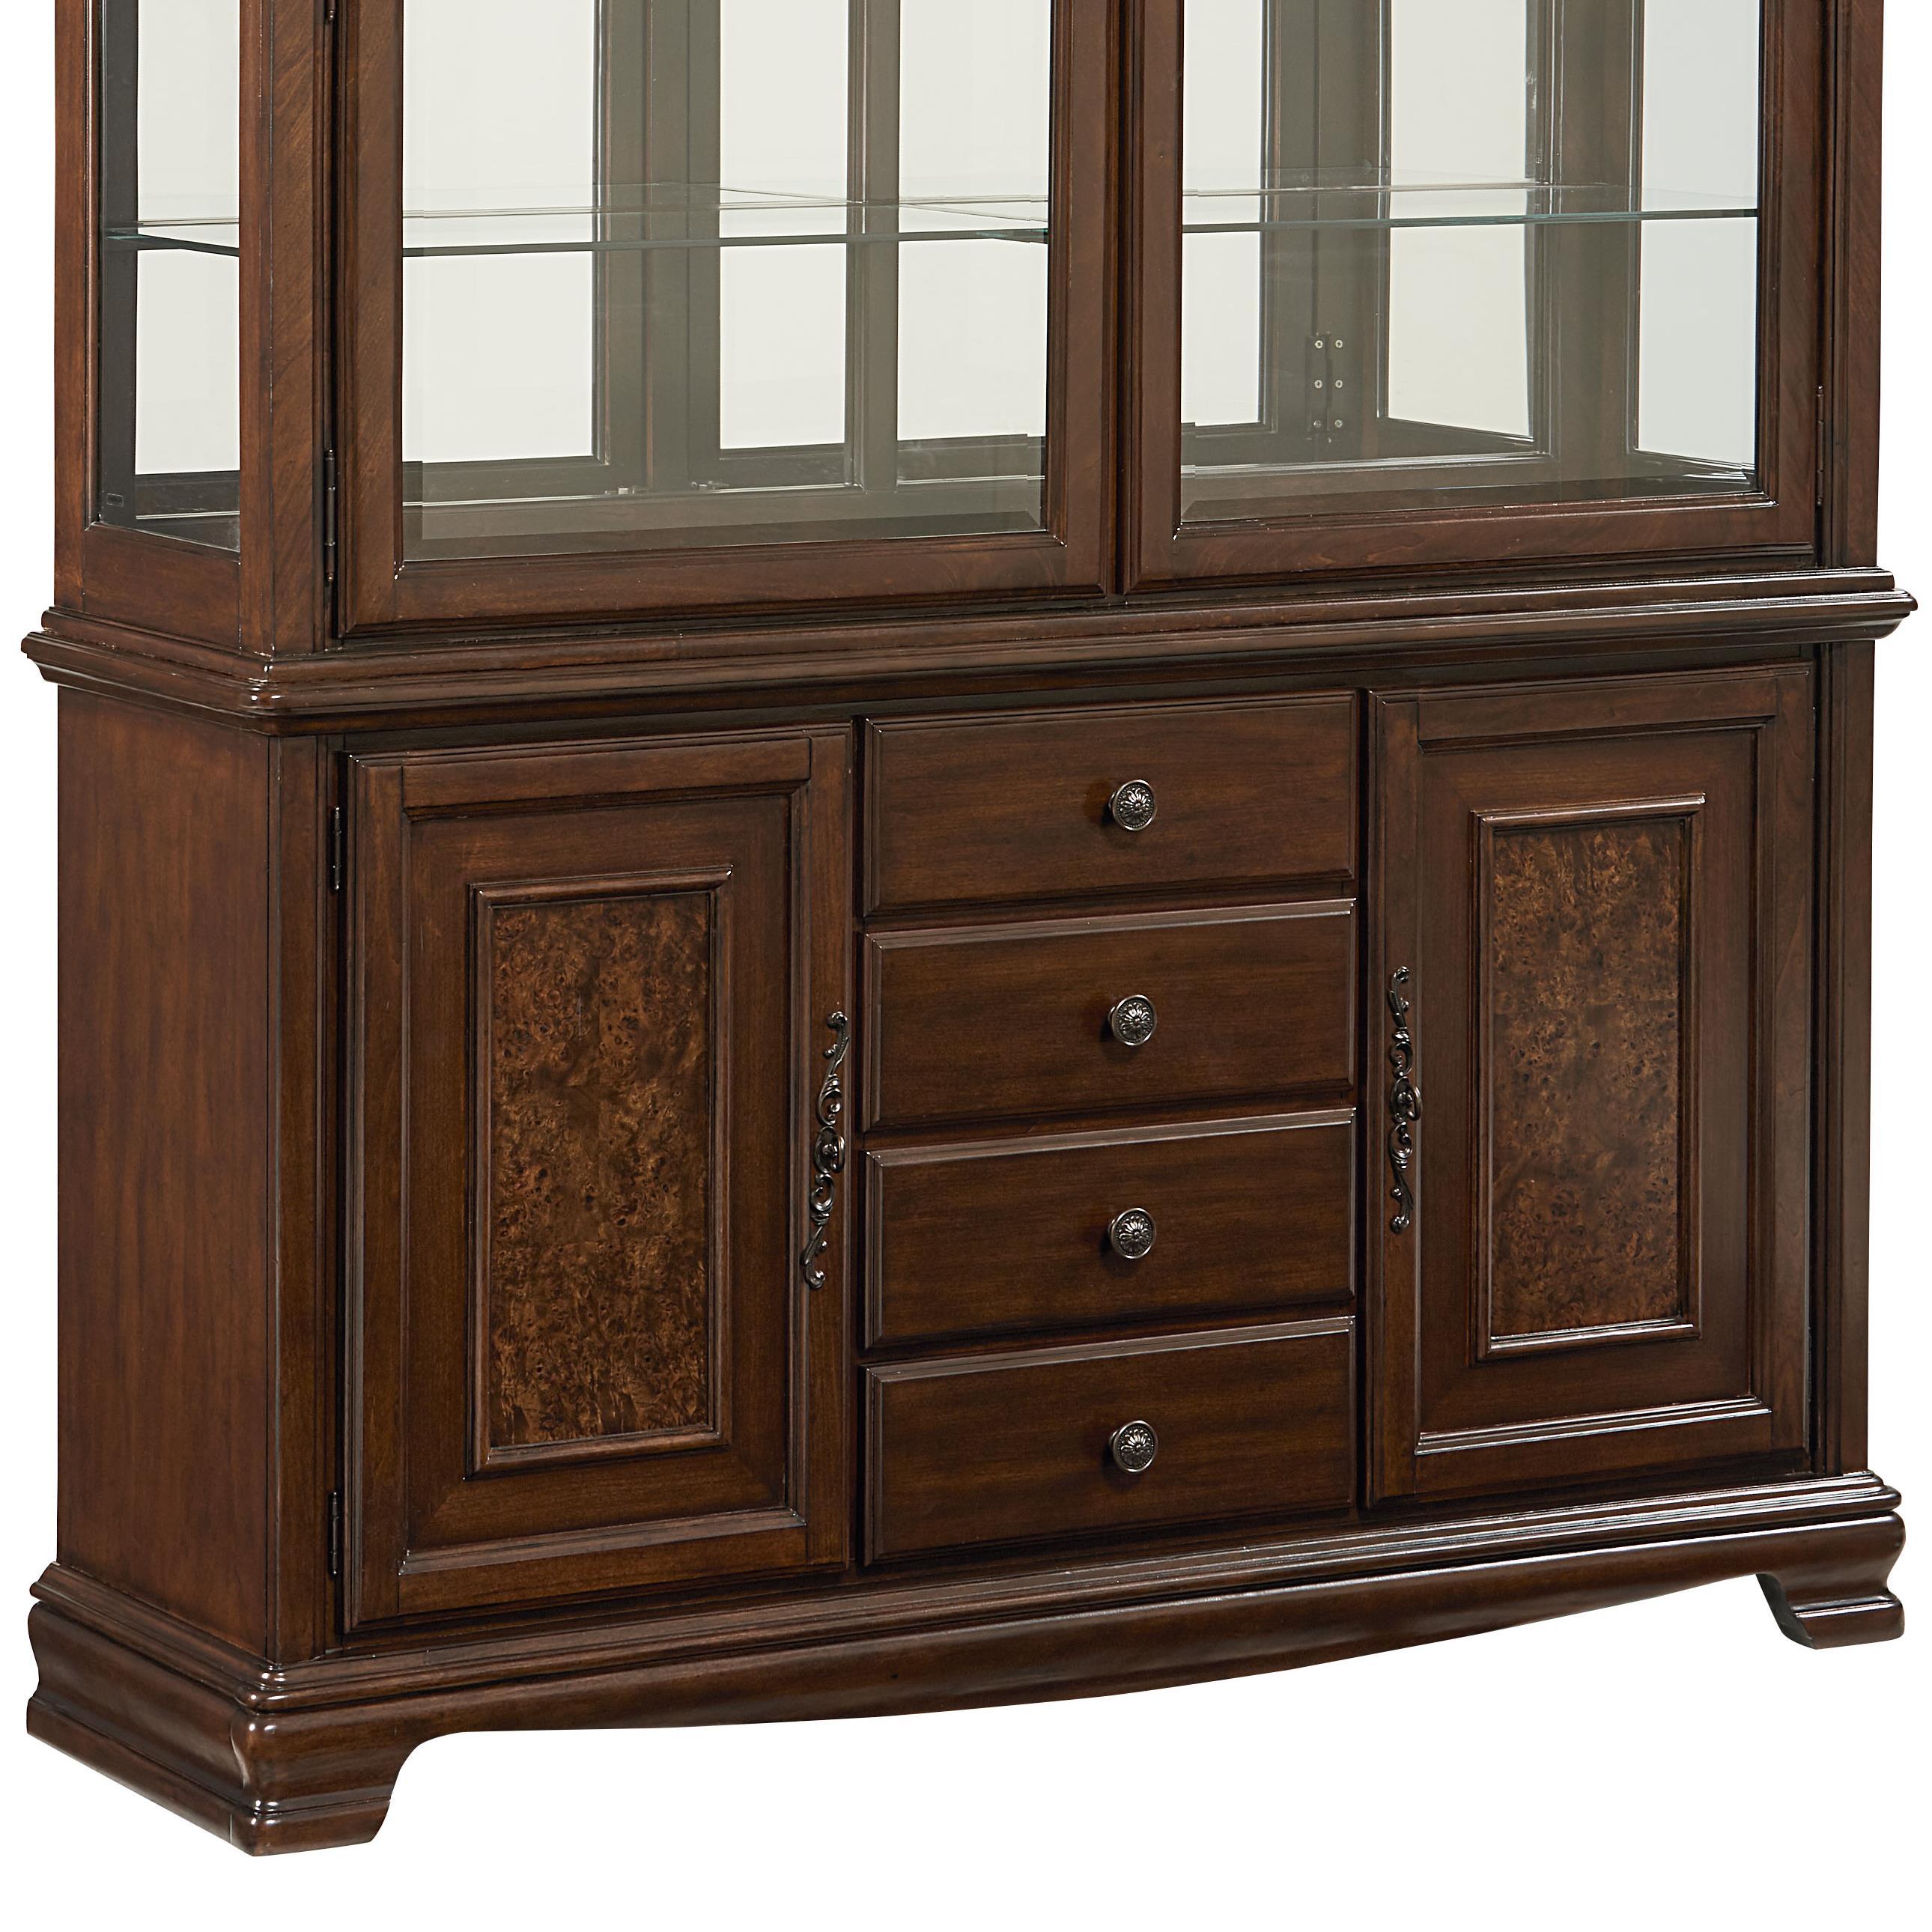 Standard Furniture Carrington Dining Buffet                               - Item Number: 17028